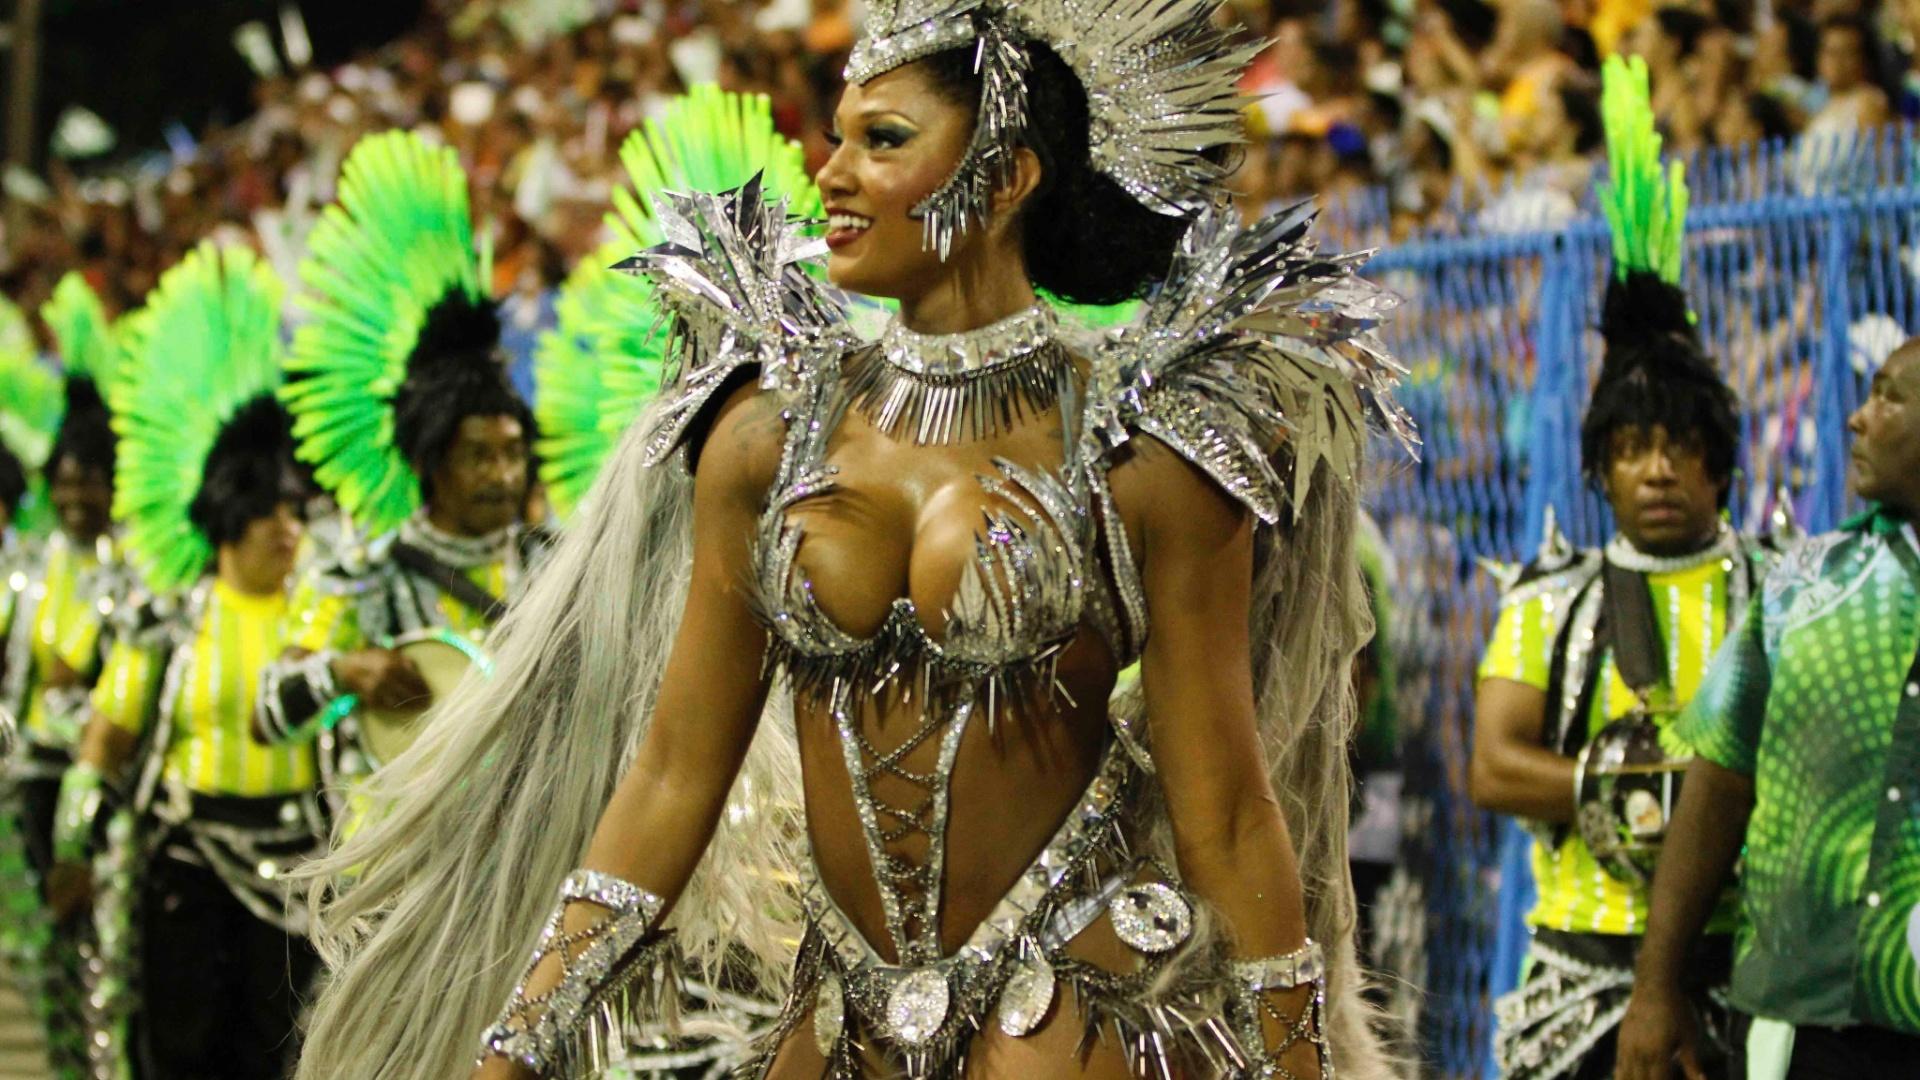 carnaval_de_rio 09.jpg